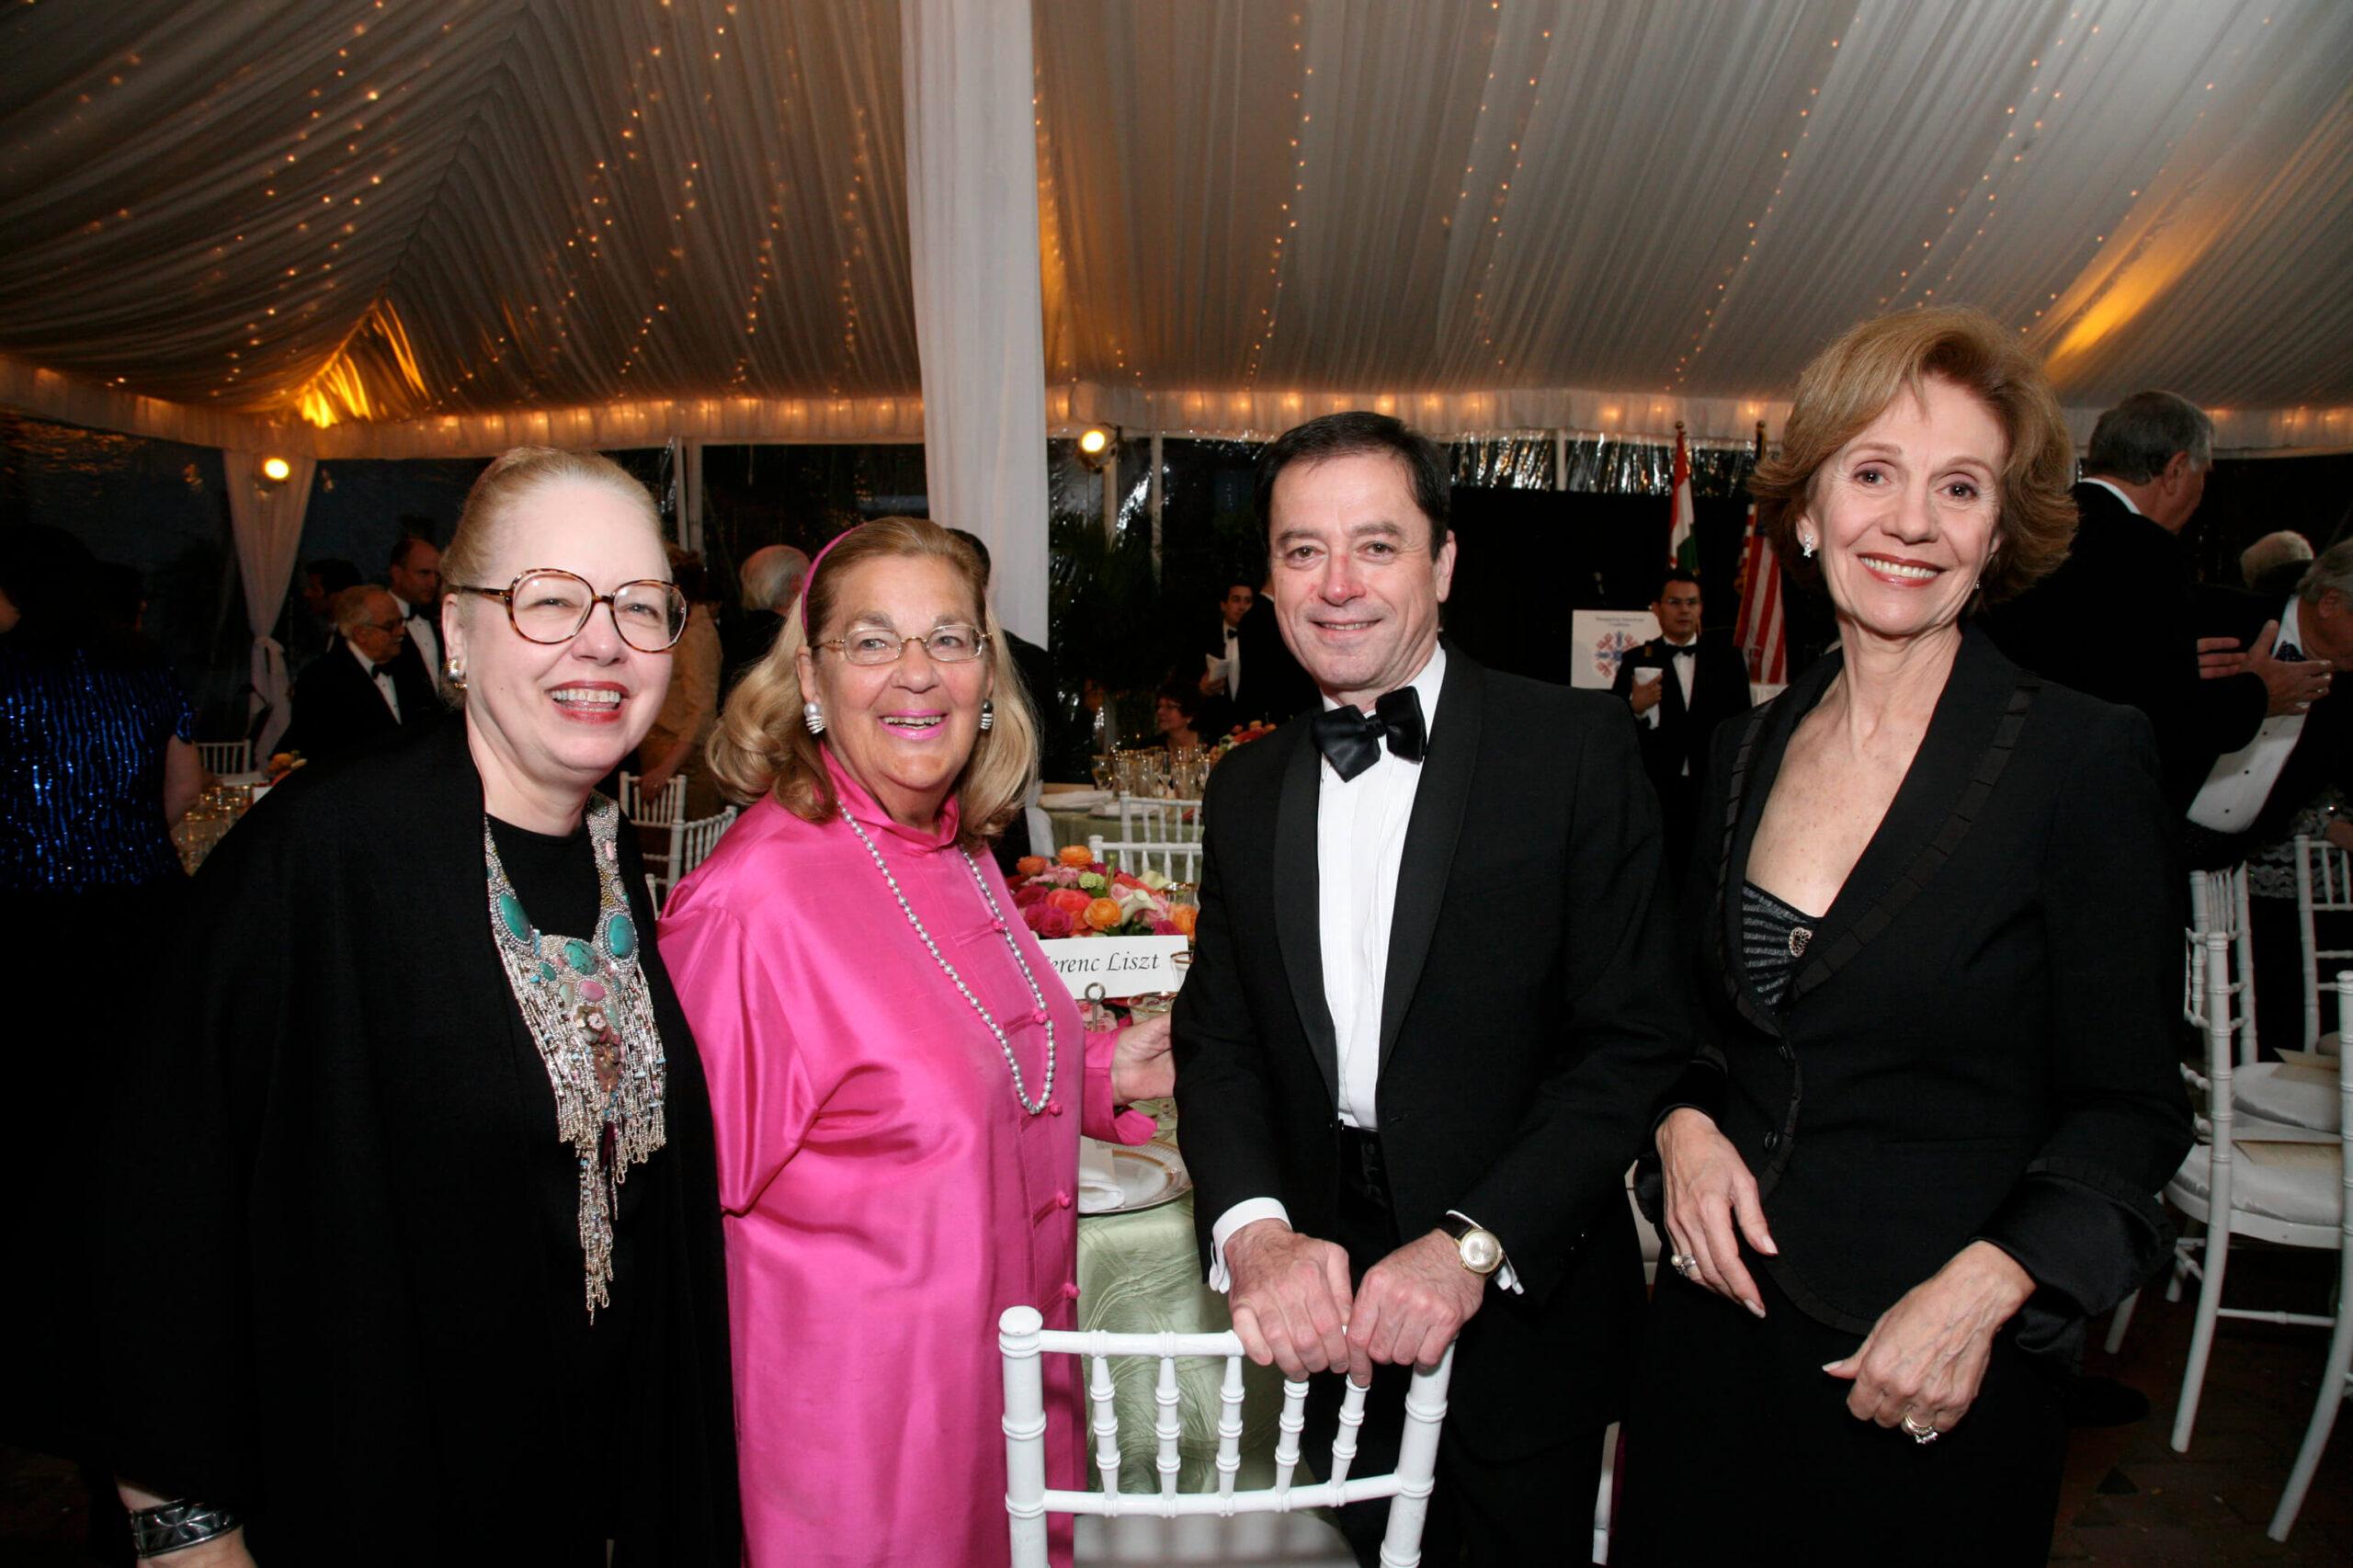 Mrs. Kathy Megyeri, Mrs. Esther Coopersmith, Amb. Andras Simonyi, Mrs. Beatriz Teleki